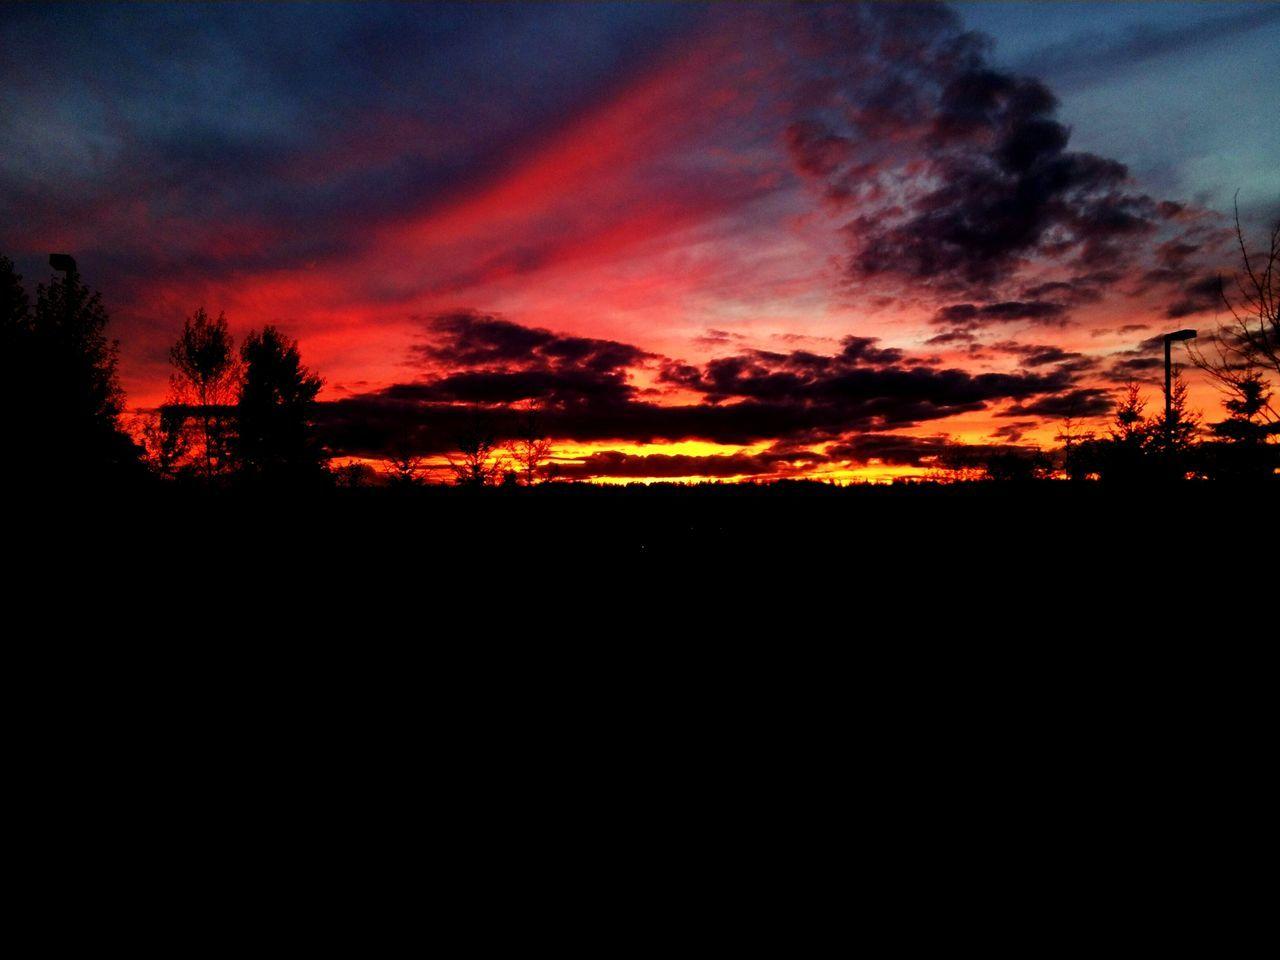 Sunset from the Molina car park. Molina Bothell Canyon Park First Eyeem Photo